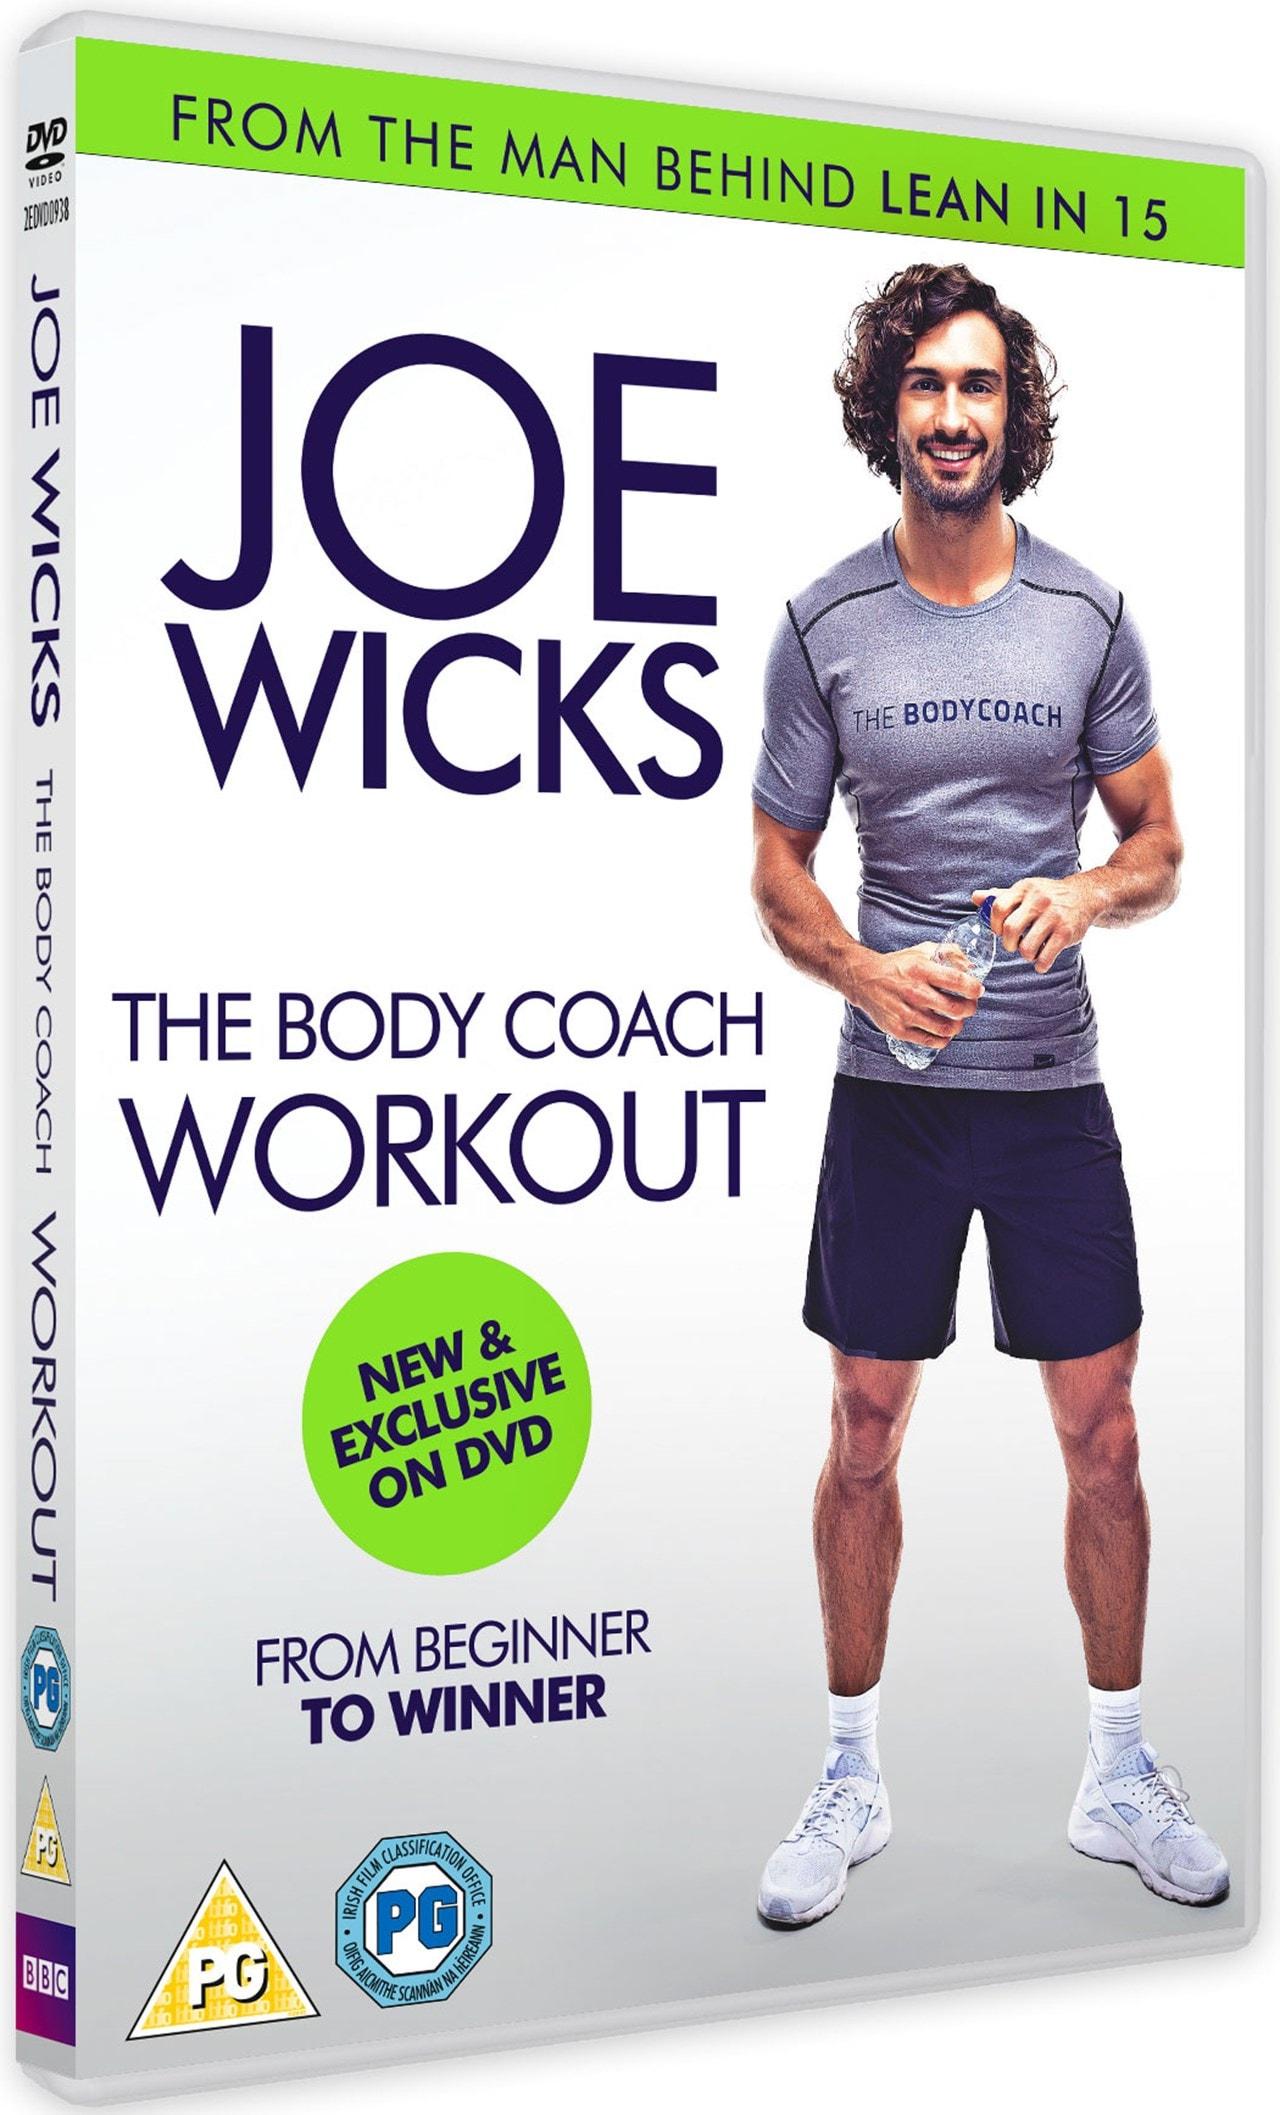 Joe Wicks - The Body Coach Workout - 2